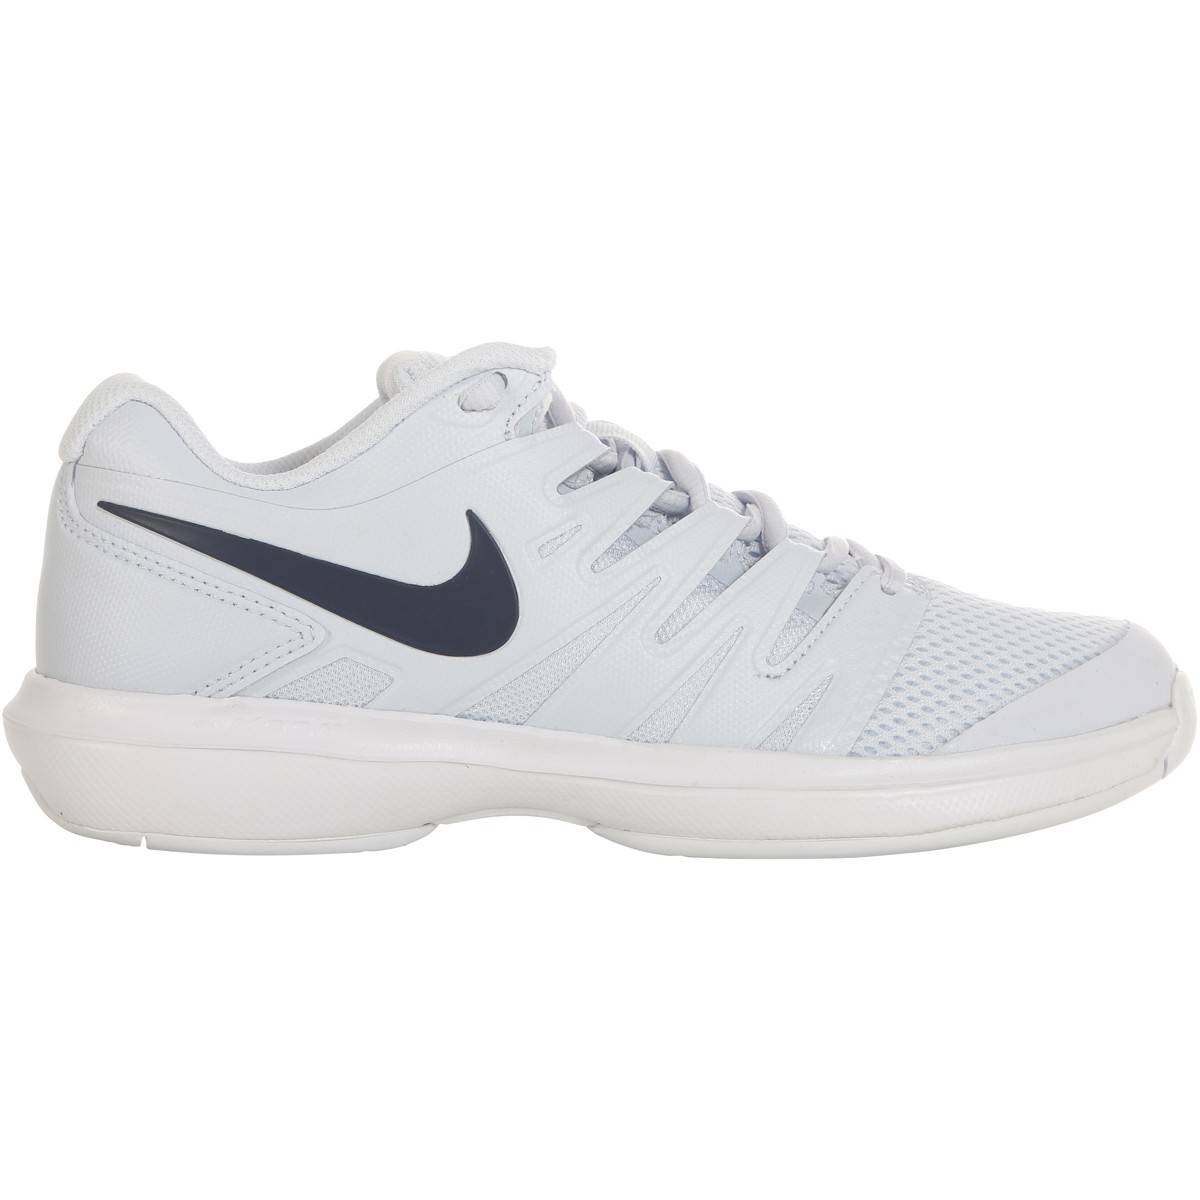 Chaussures Nike Femme Air Zoom Vapor Prestige Toutes